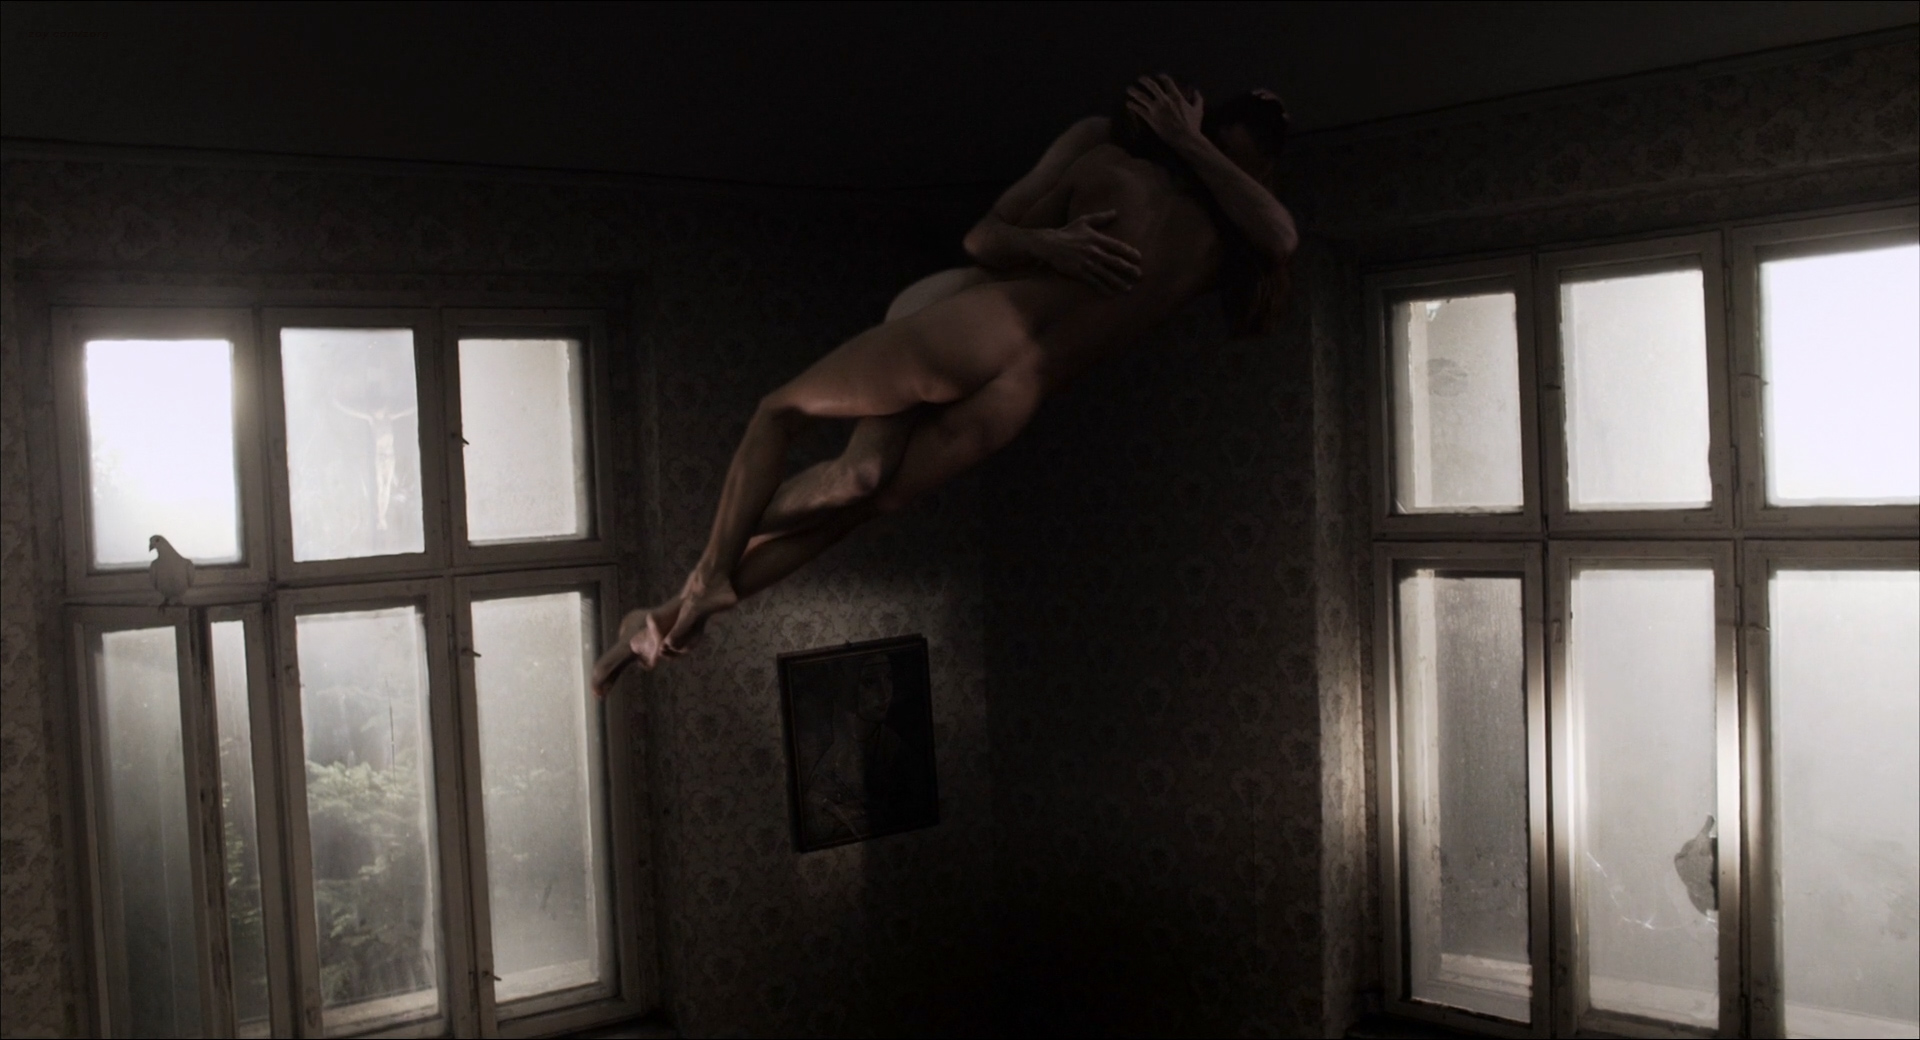 Ewa Matula nude busty boobs Karolina Korta hot others nude butt - Onirica (PL-2014) HD 1080p BluRay (10)